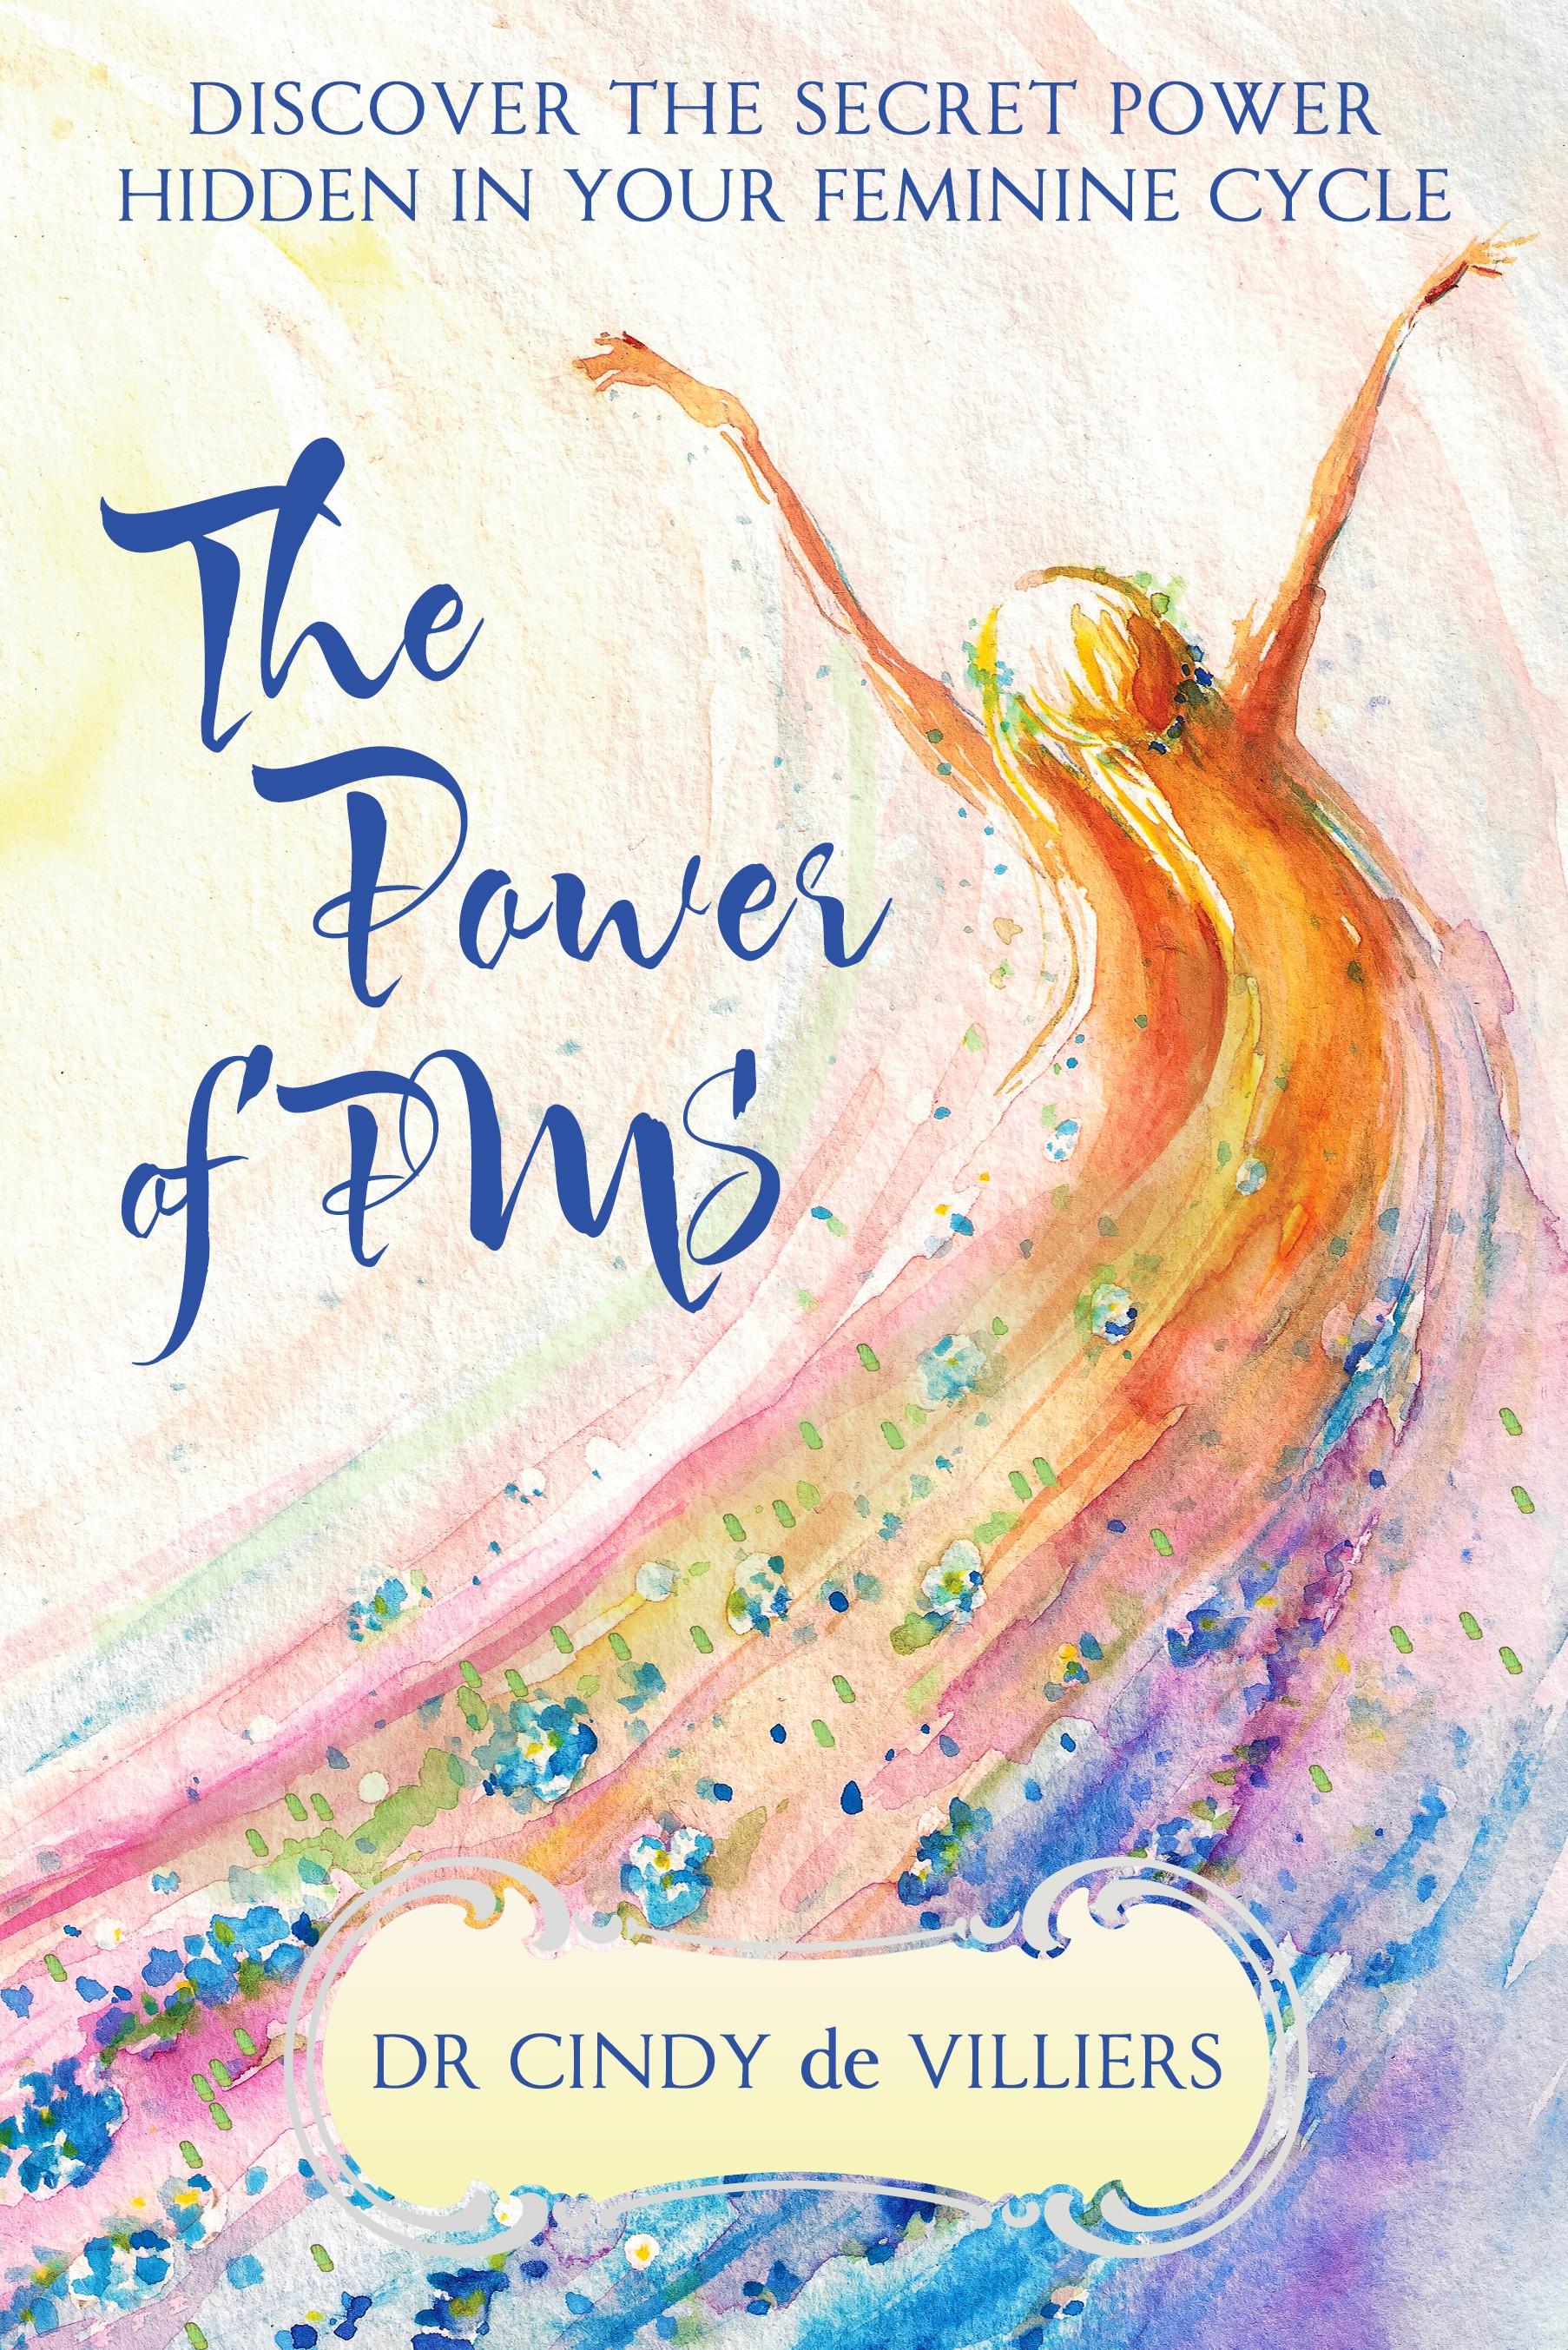 Design a portrayal of feminine power for eBook cover